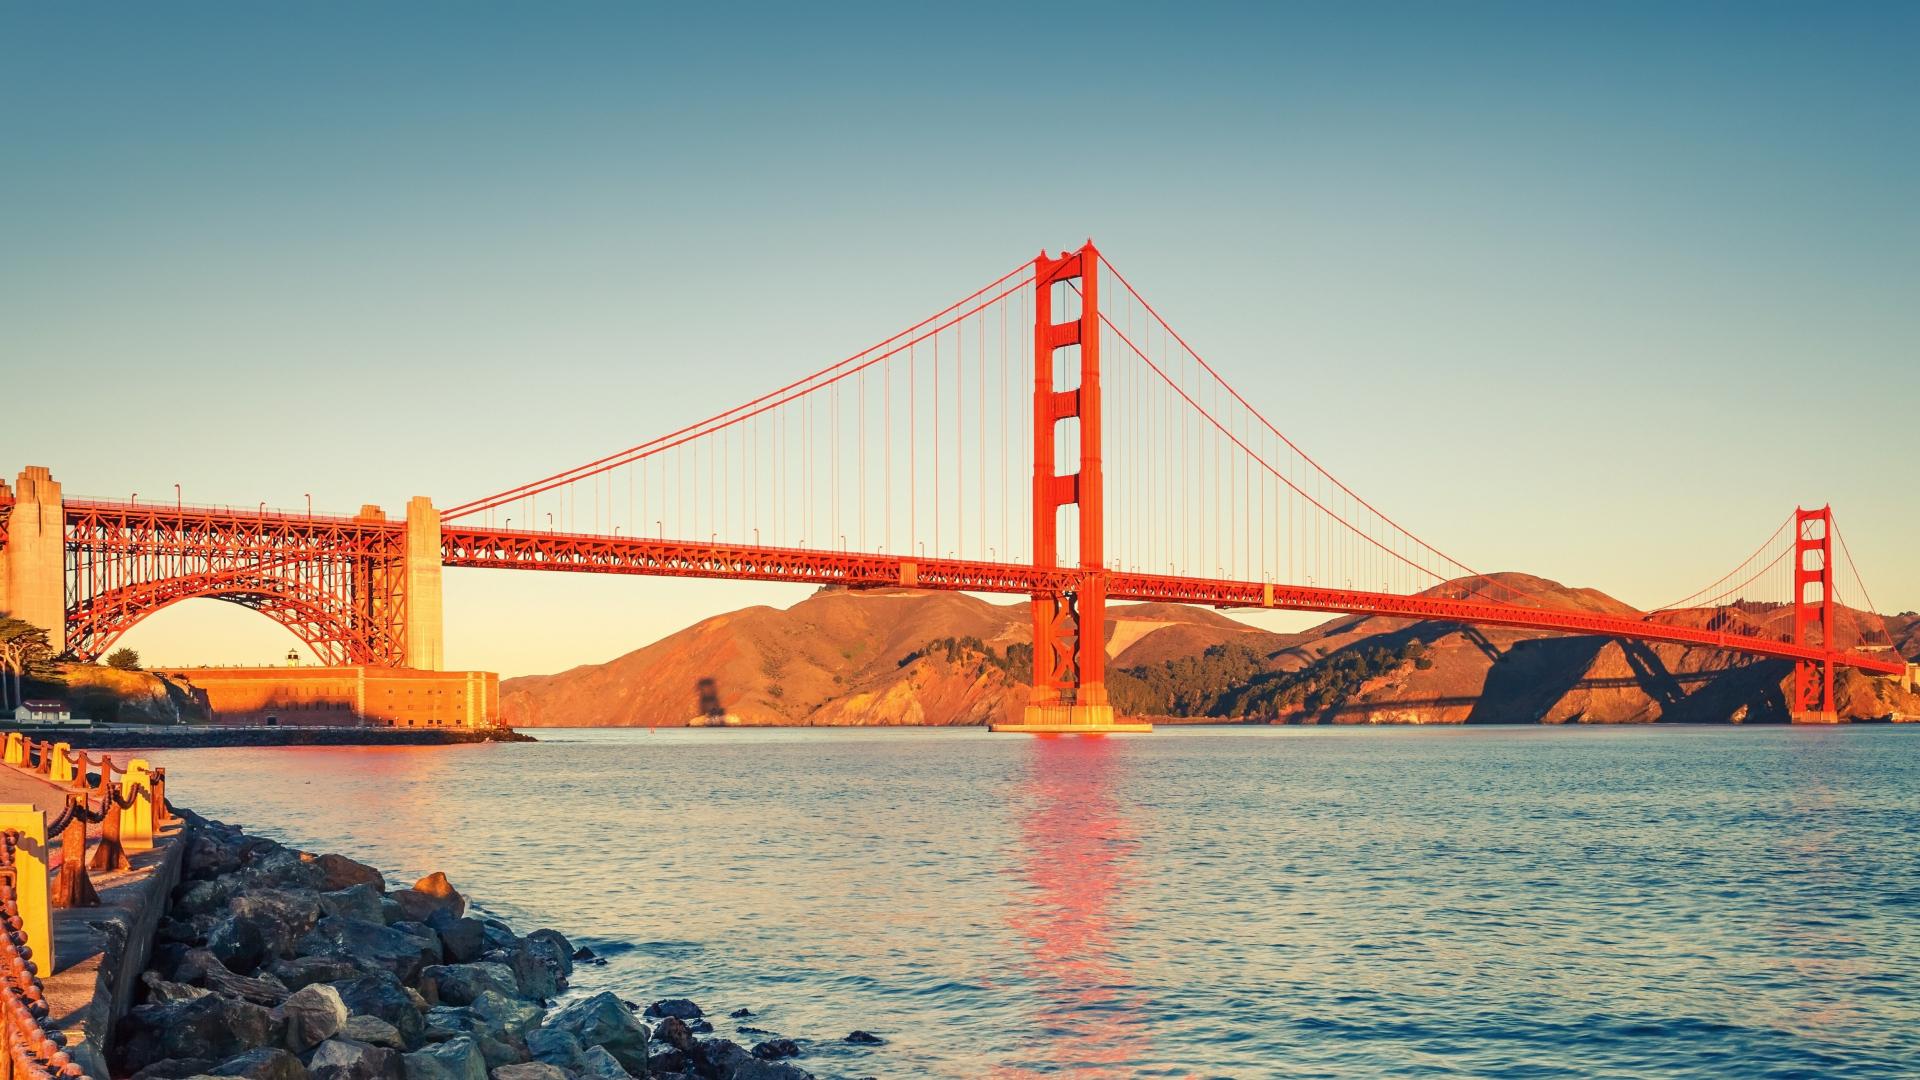 Download 1920x1080 Wallpaper Bridge Architecture Golden Gate